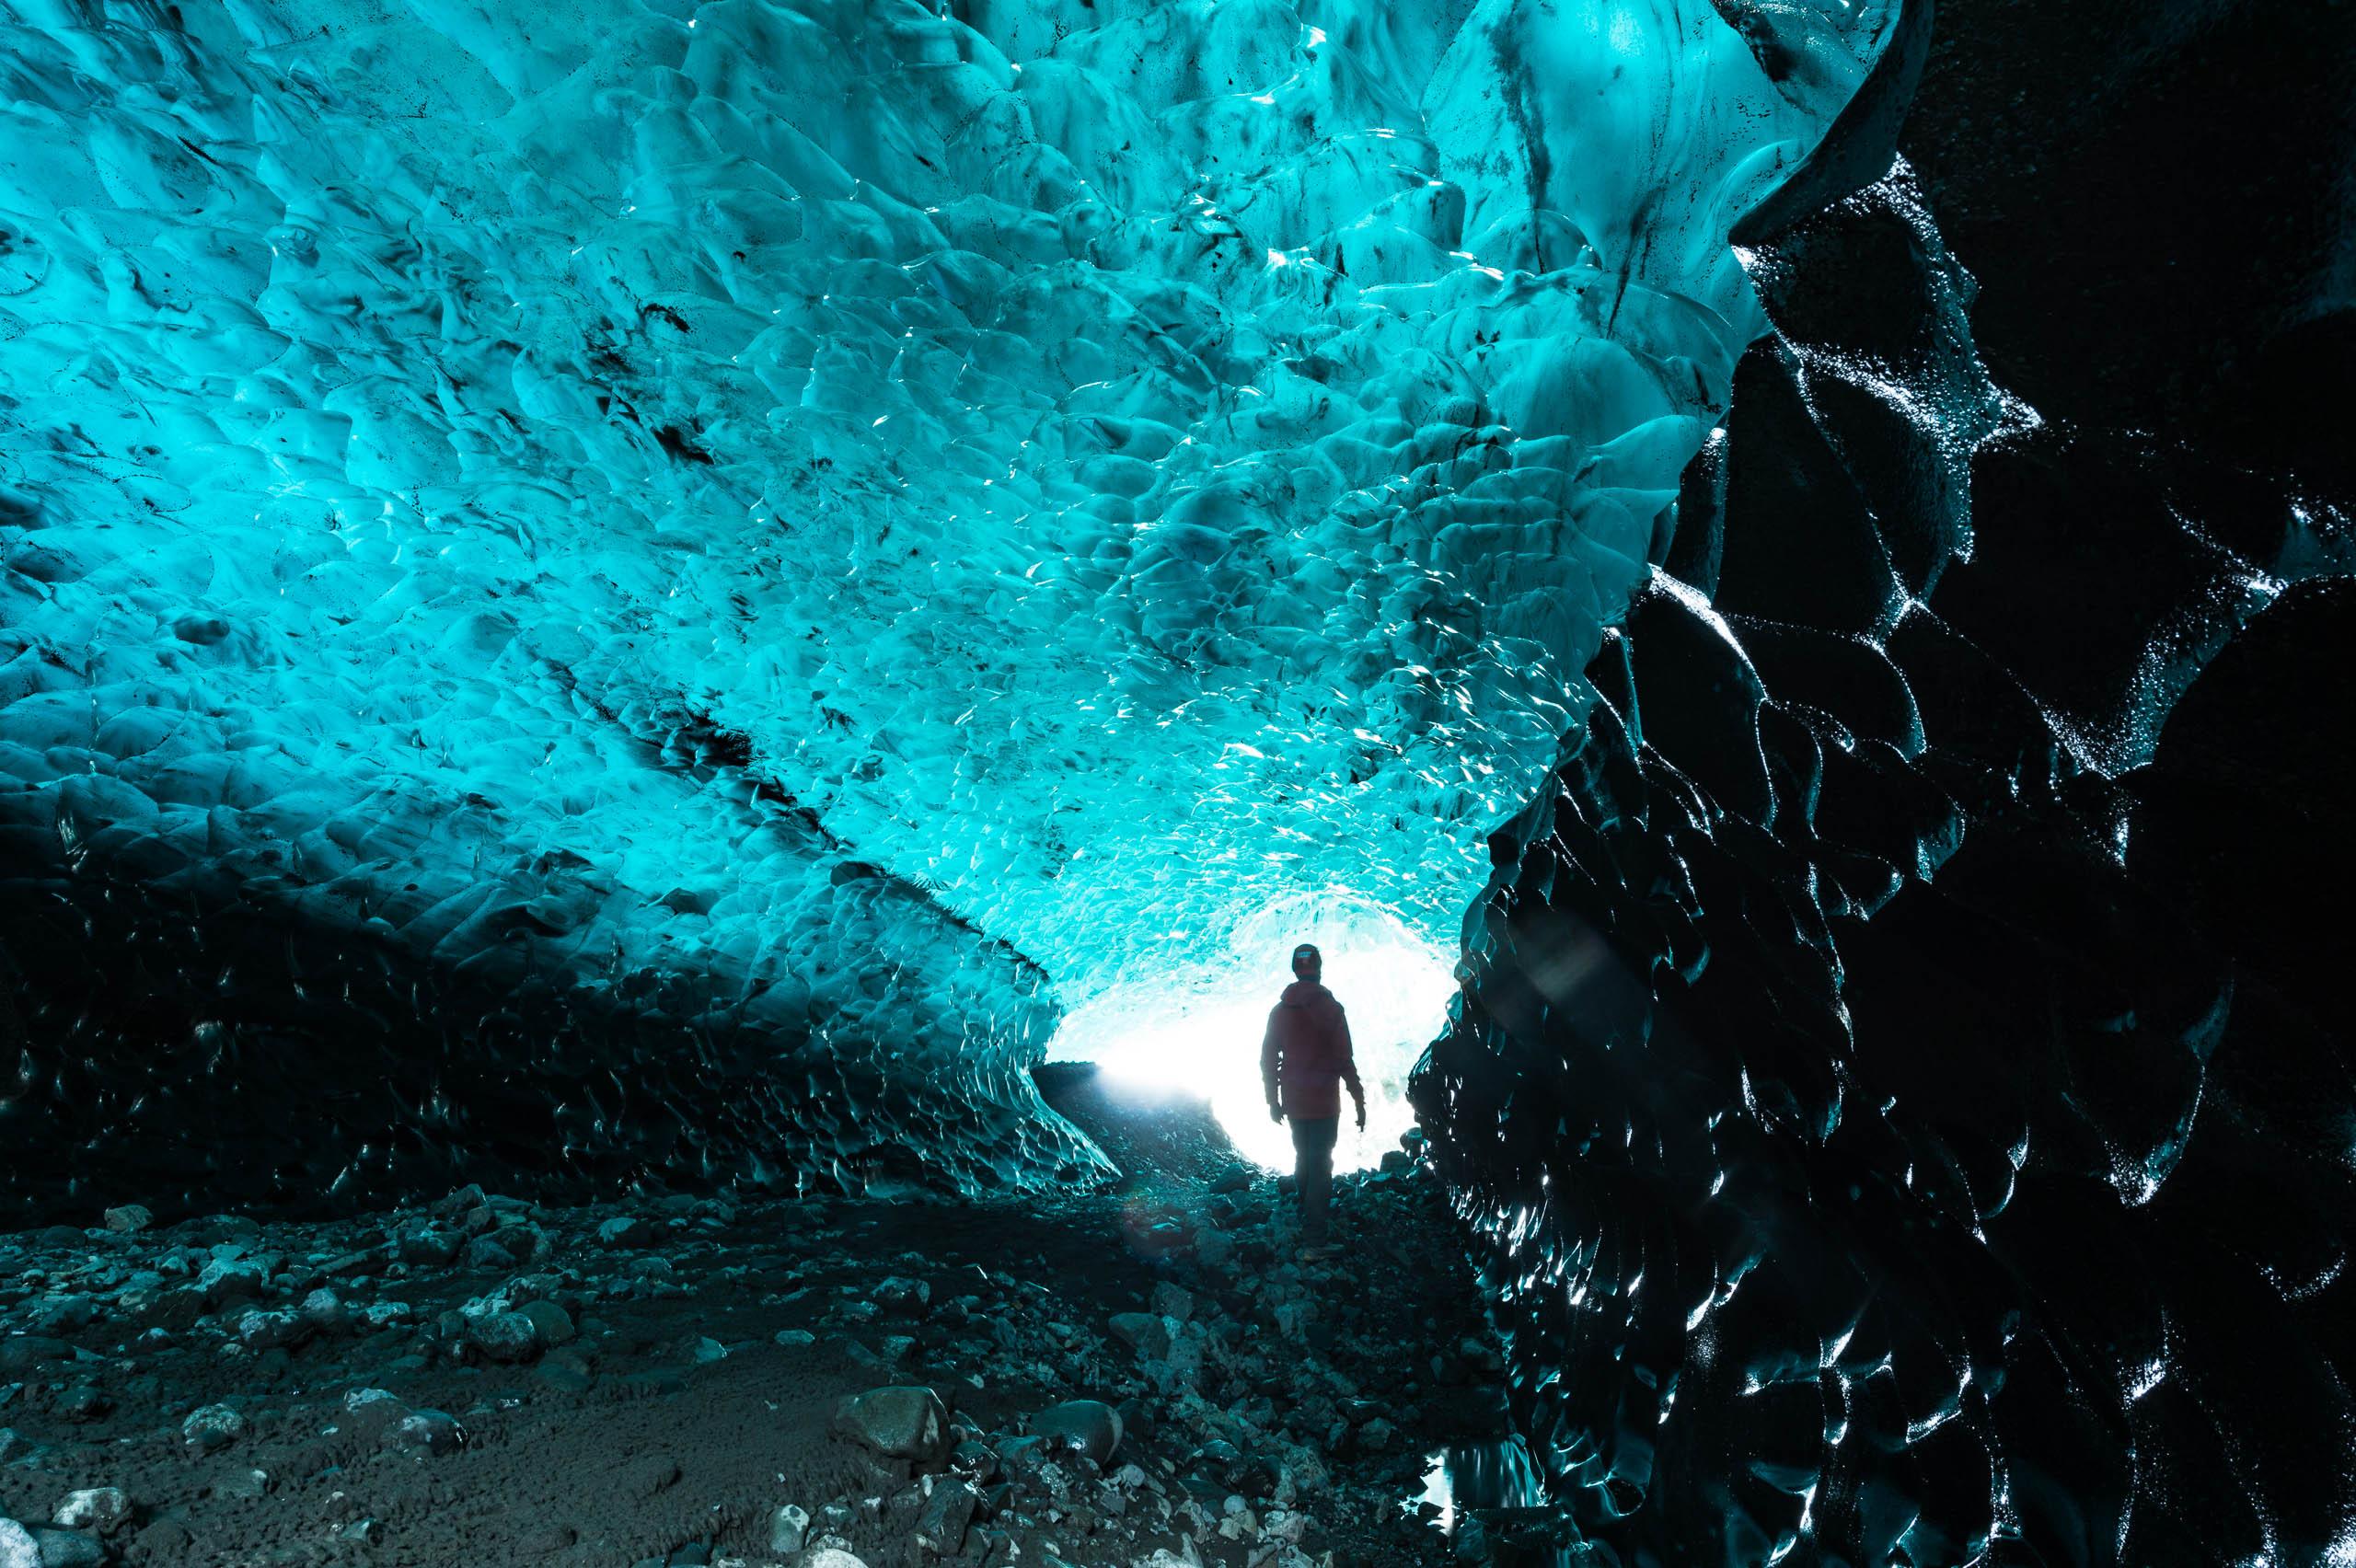 Sapphire Ice Cave (2020)